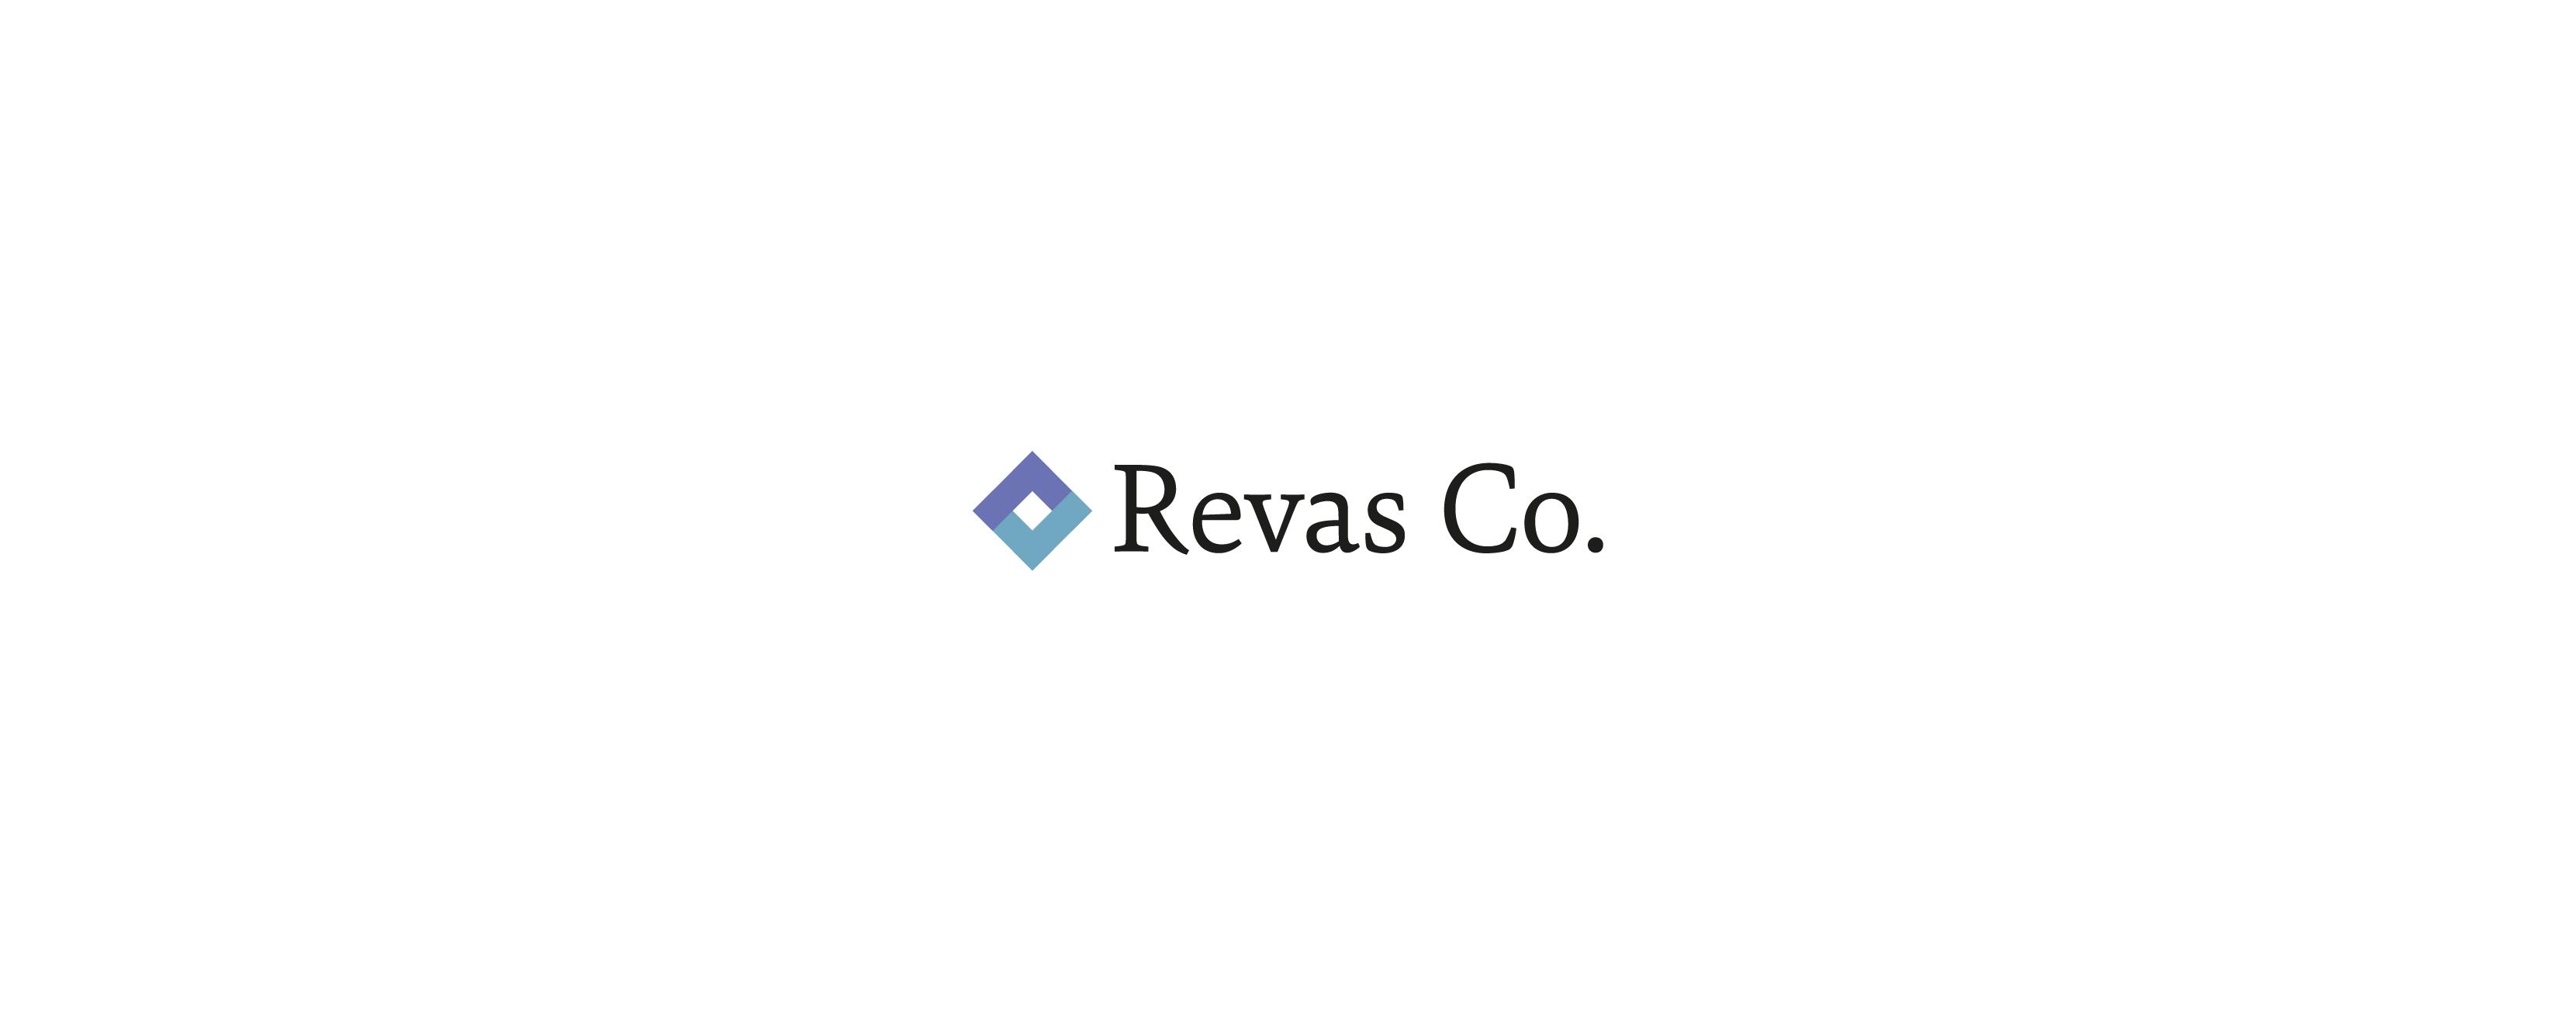 Revas Company logo